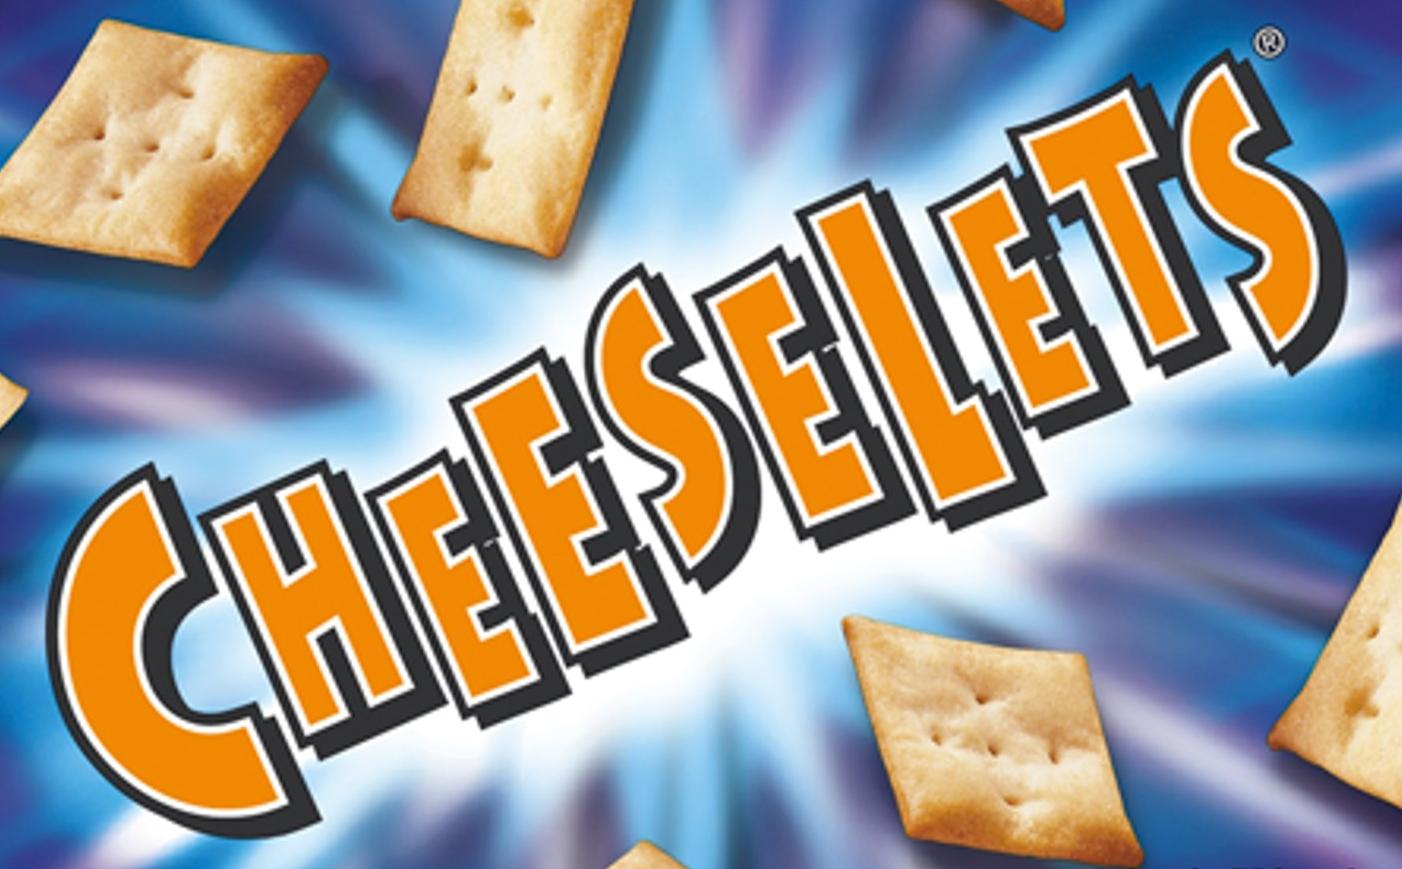 Jacob's Cheeselets